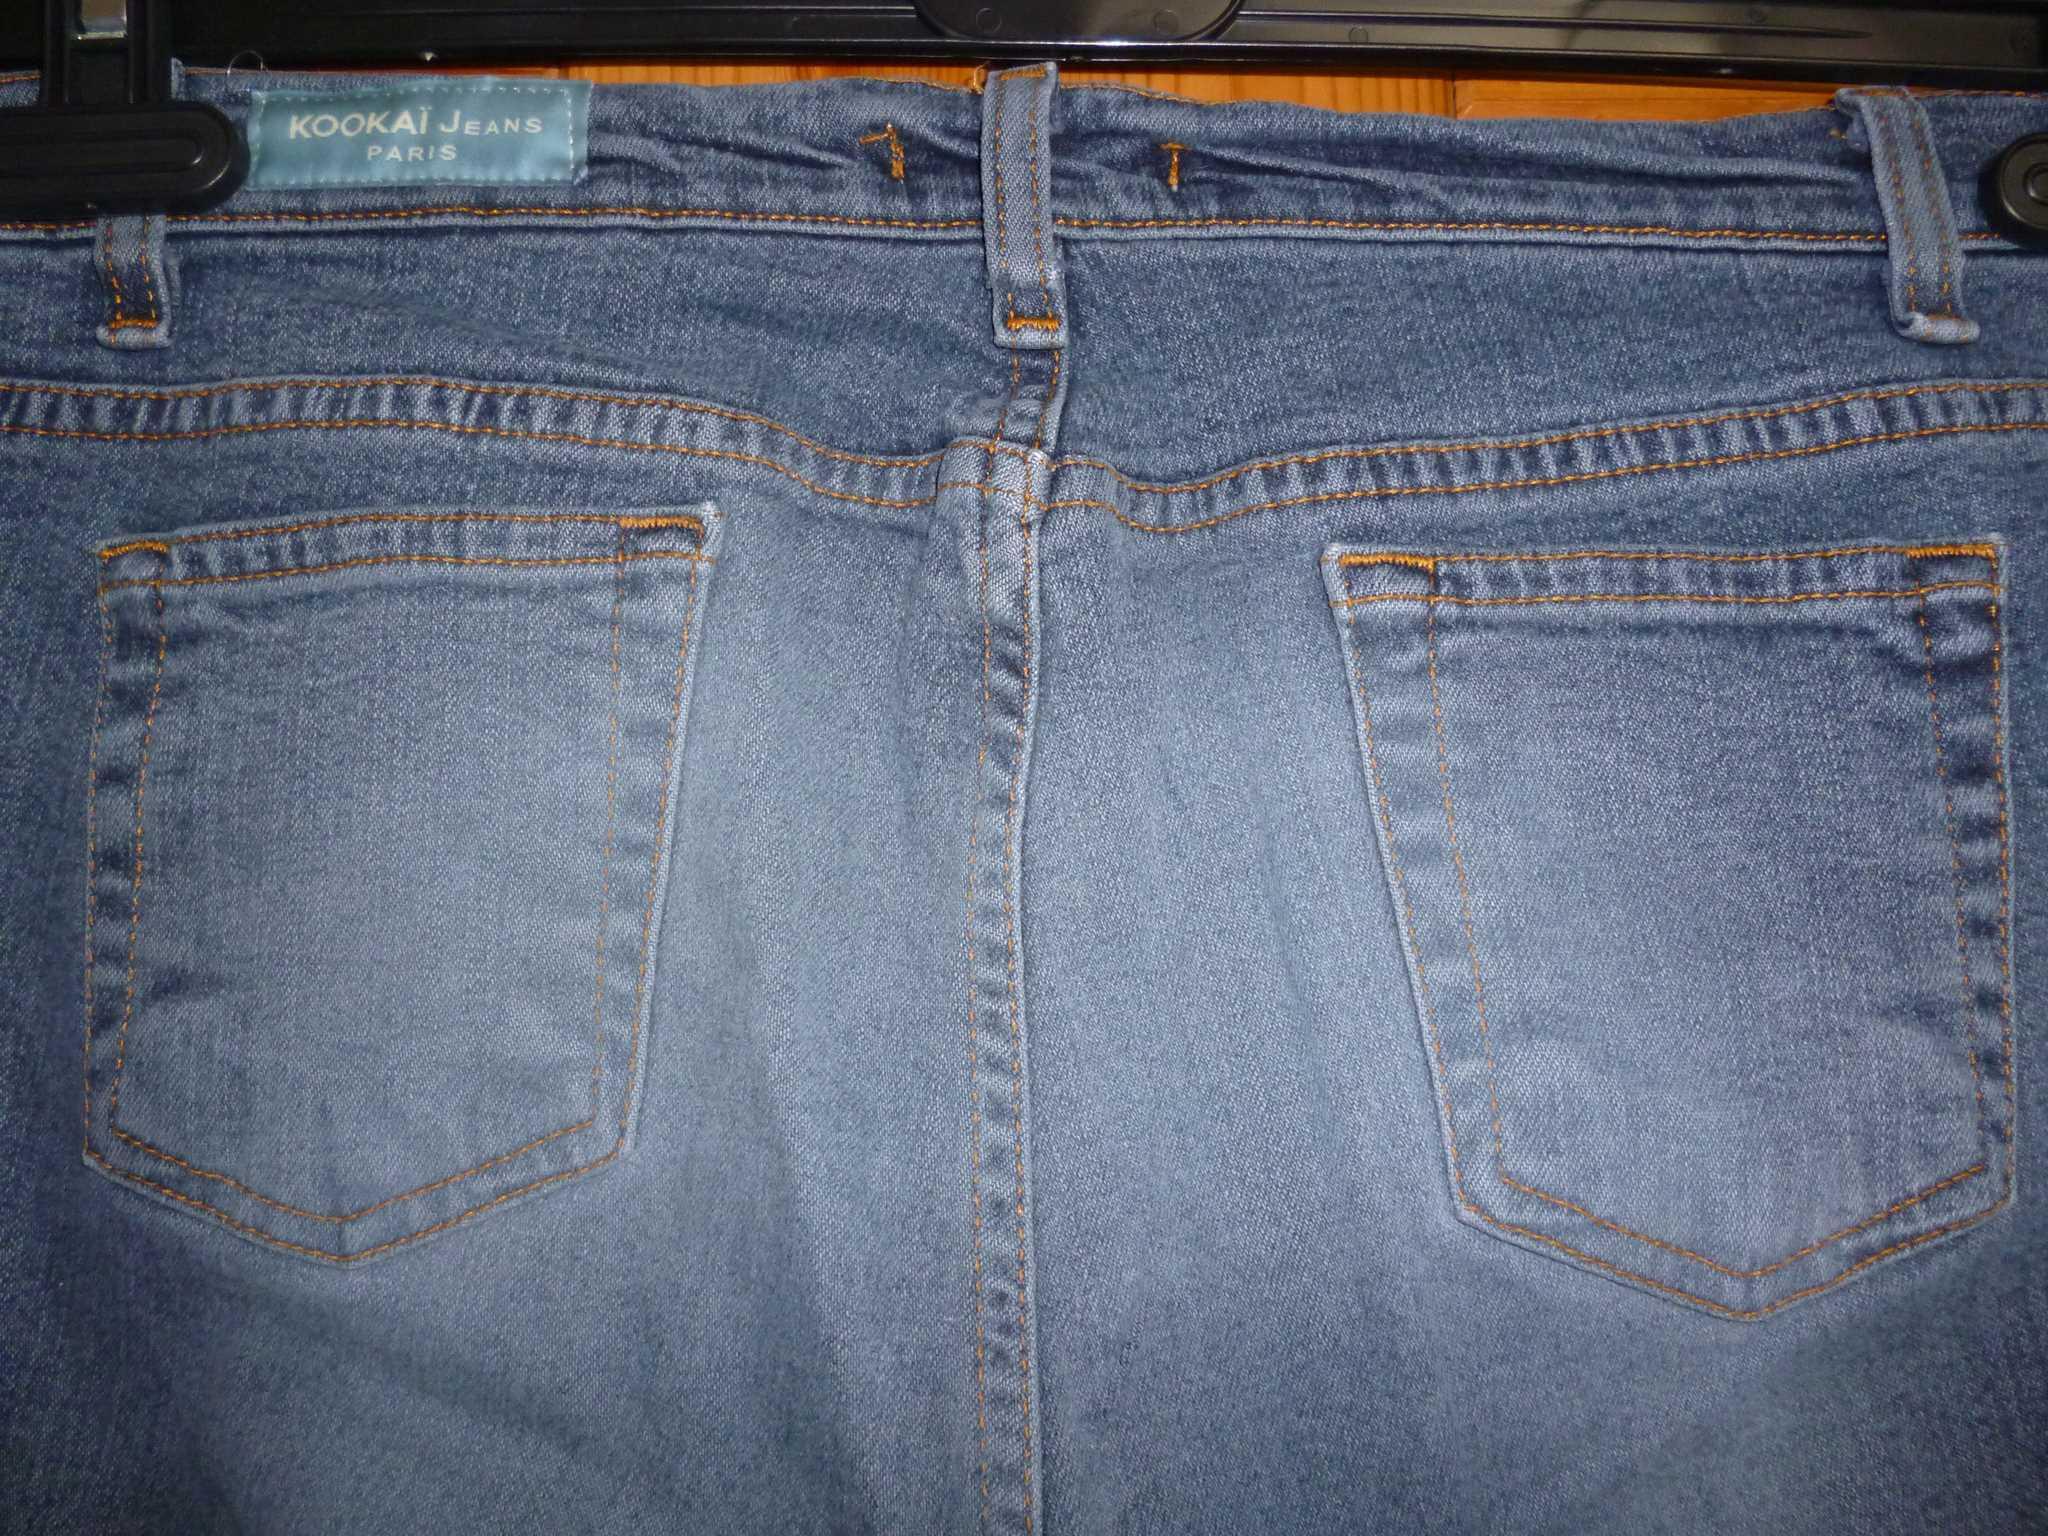 kookai jeans hosen gr 40 42 pantalons jeans size 32 hosen jeans. Black Bedroom Furniture Sets. Home Design Ideas